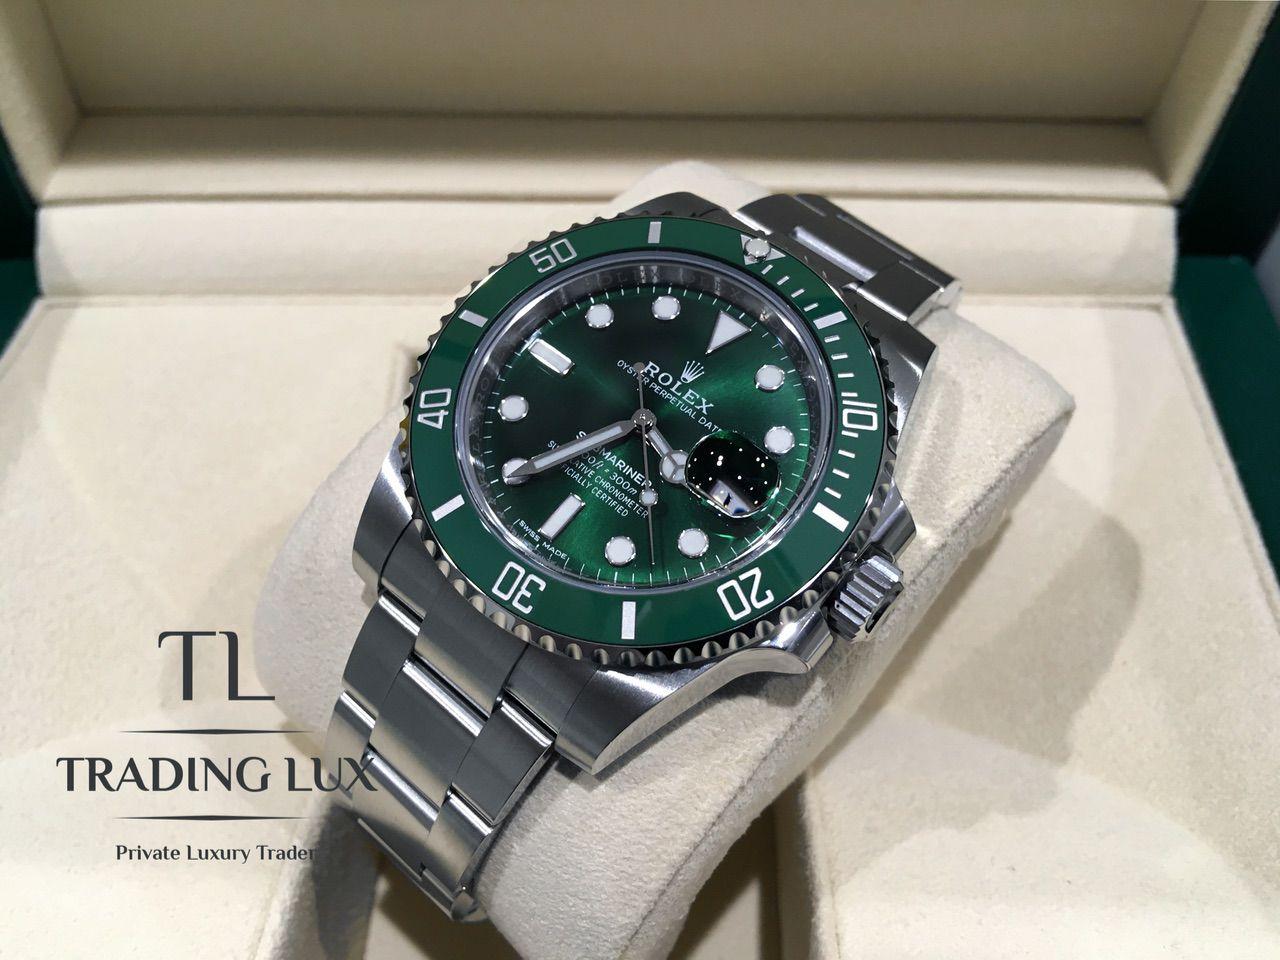 Rolex-116610LV-Hulk-4